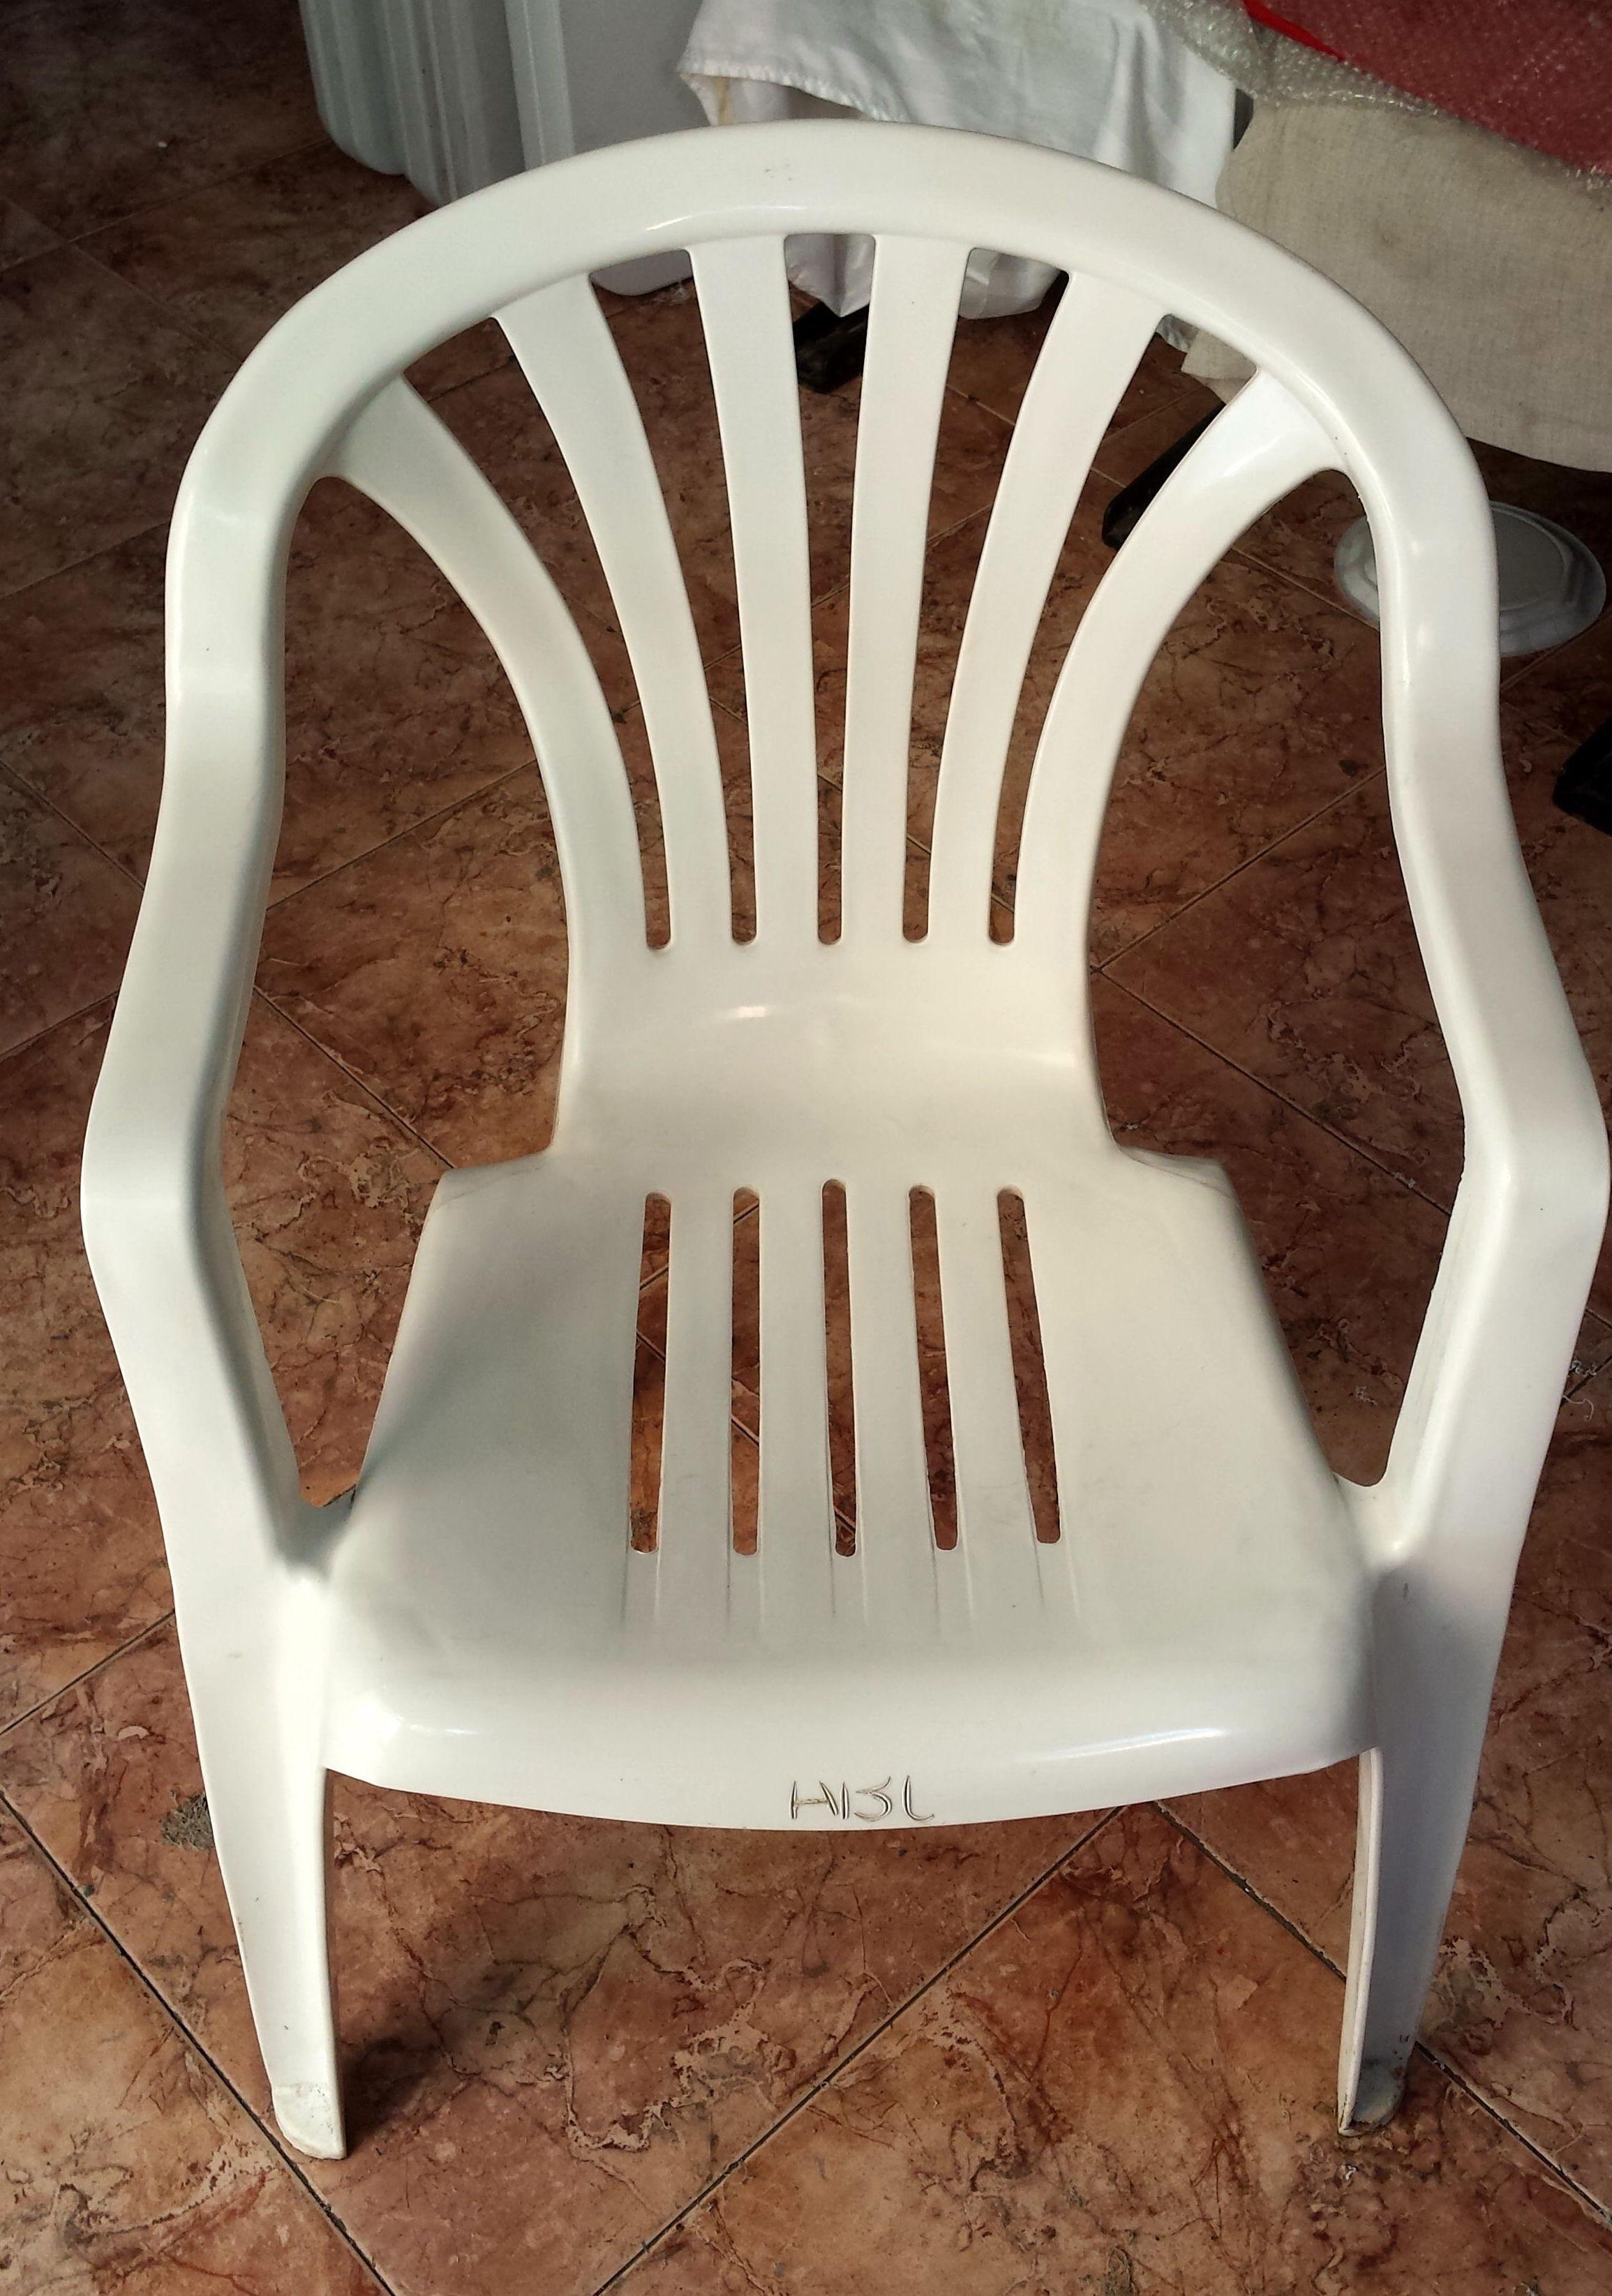 Venta de sillas usadas productos de alquileres abc for Sillas de plastico para terraza